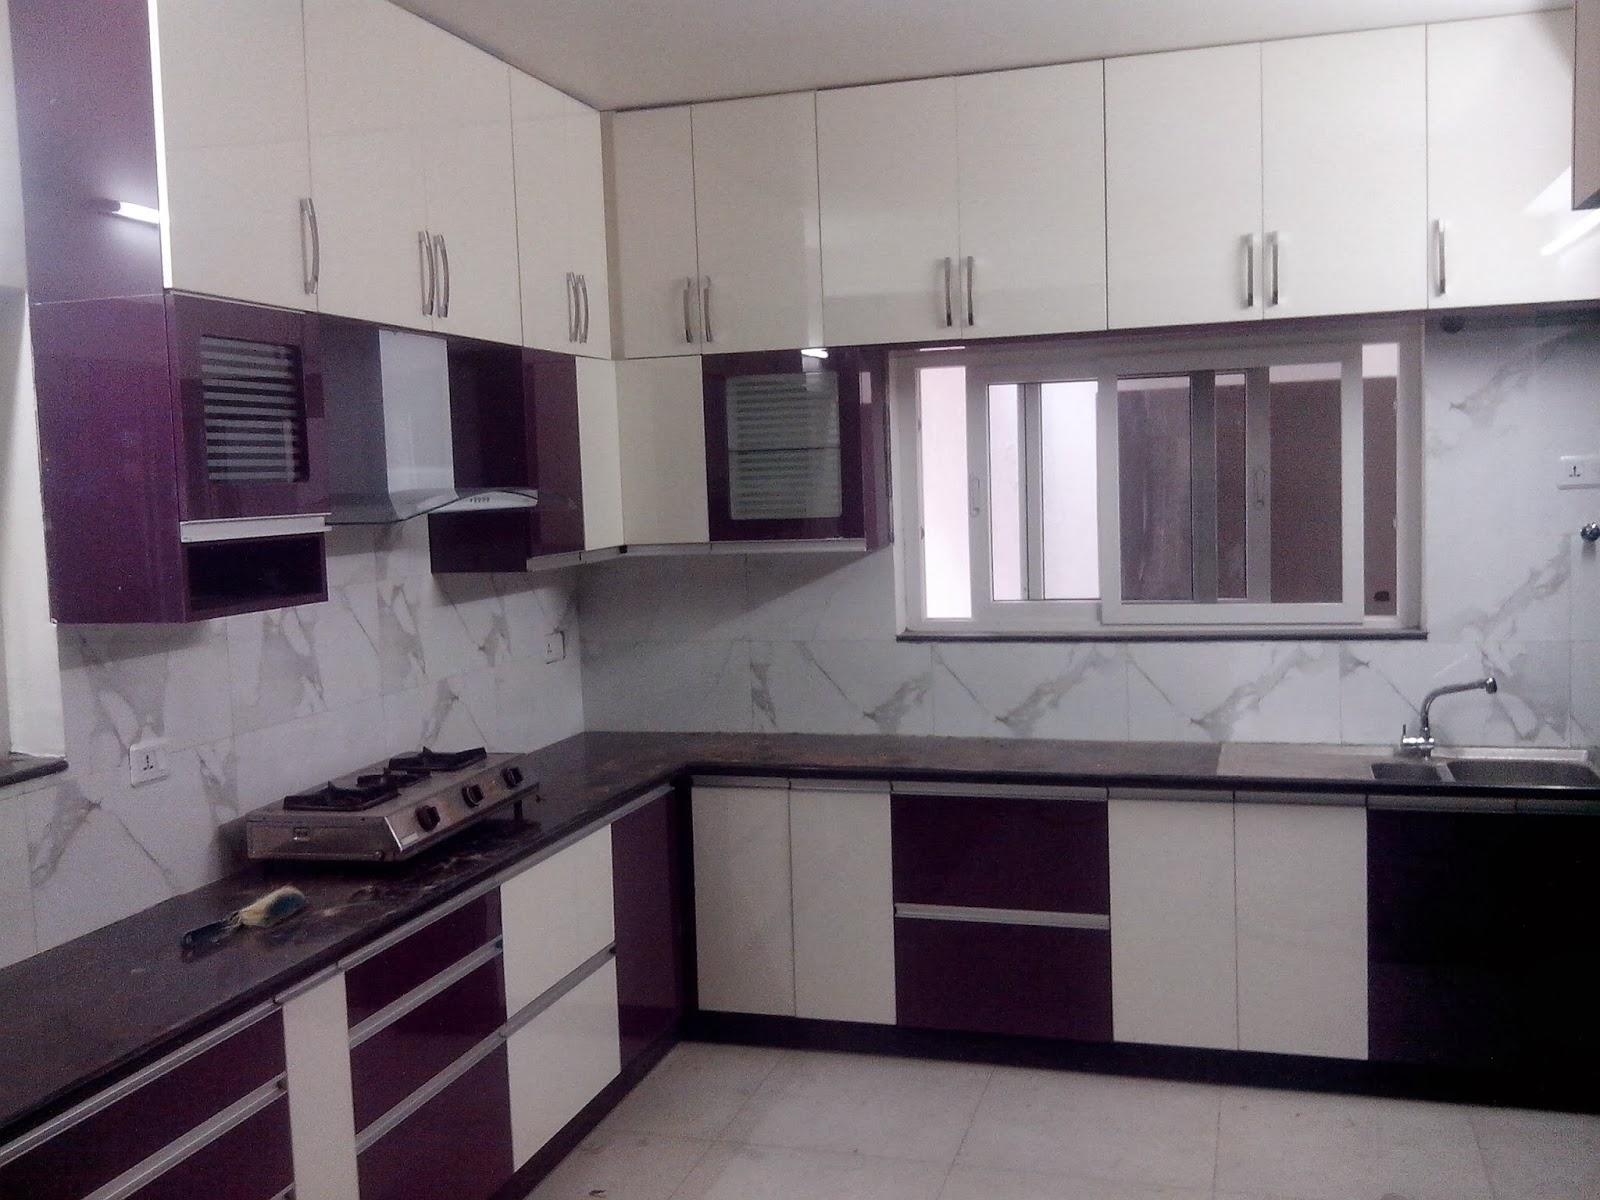 Dreamspace modular designers january 2014 - L shaped modular kitchen designs catalogue ...